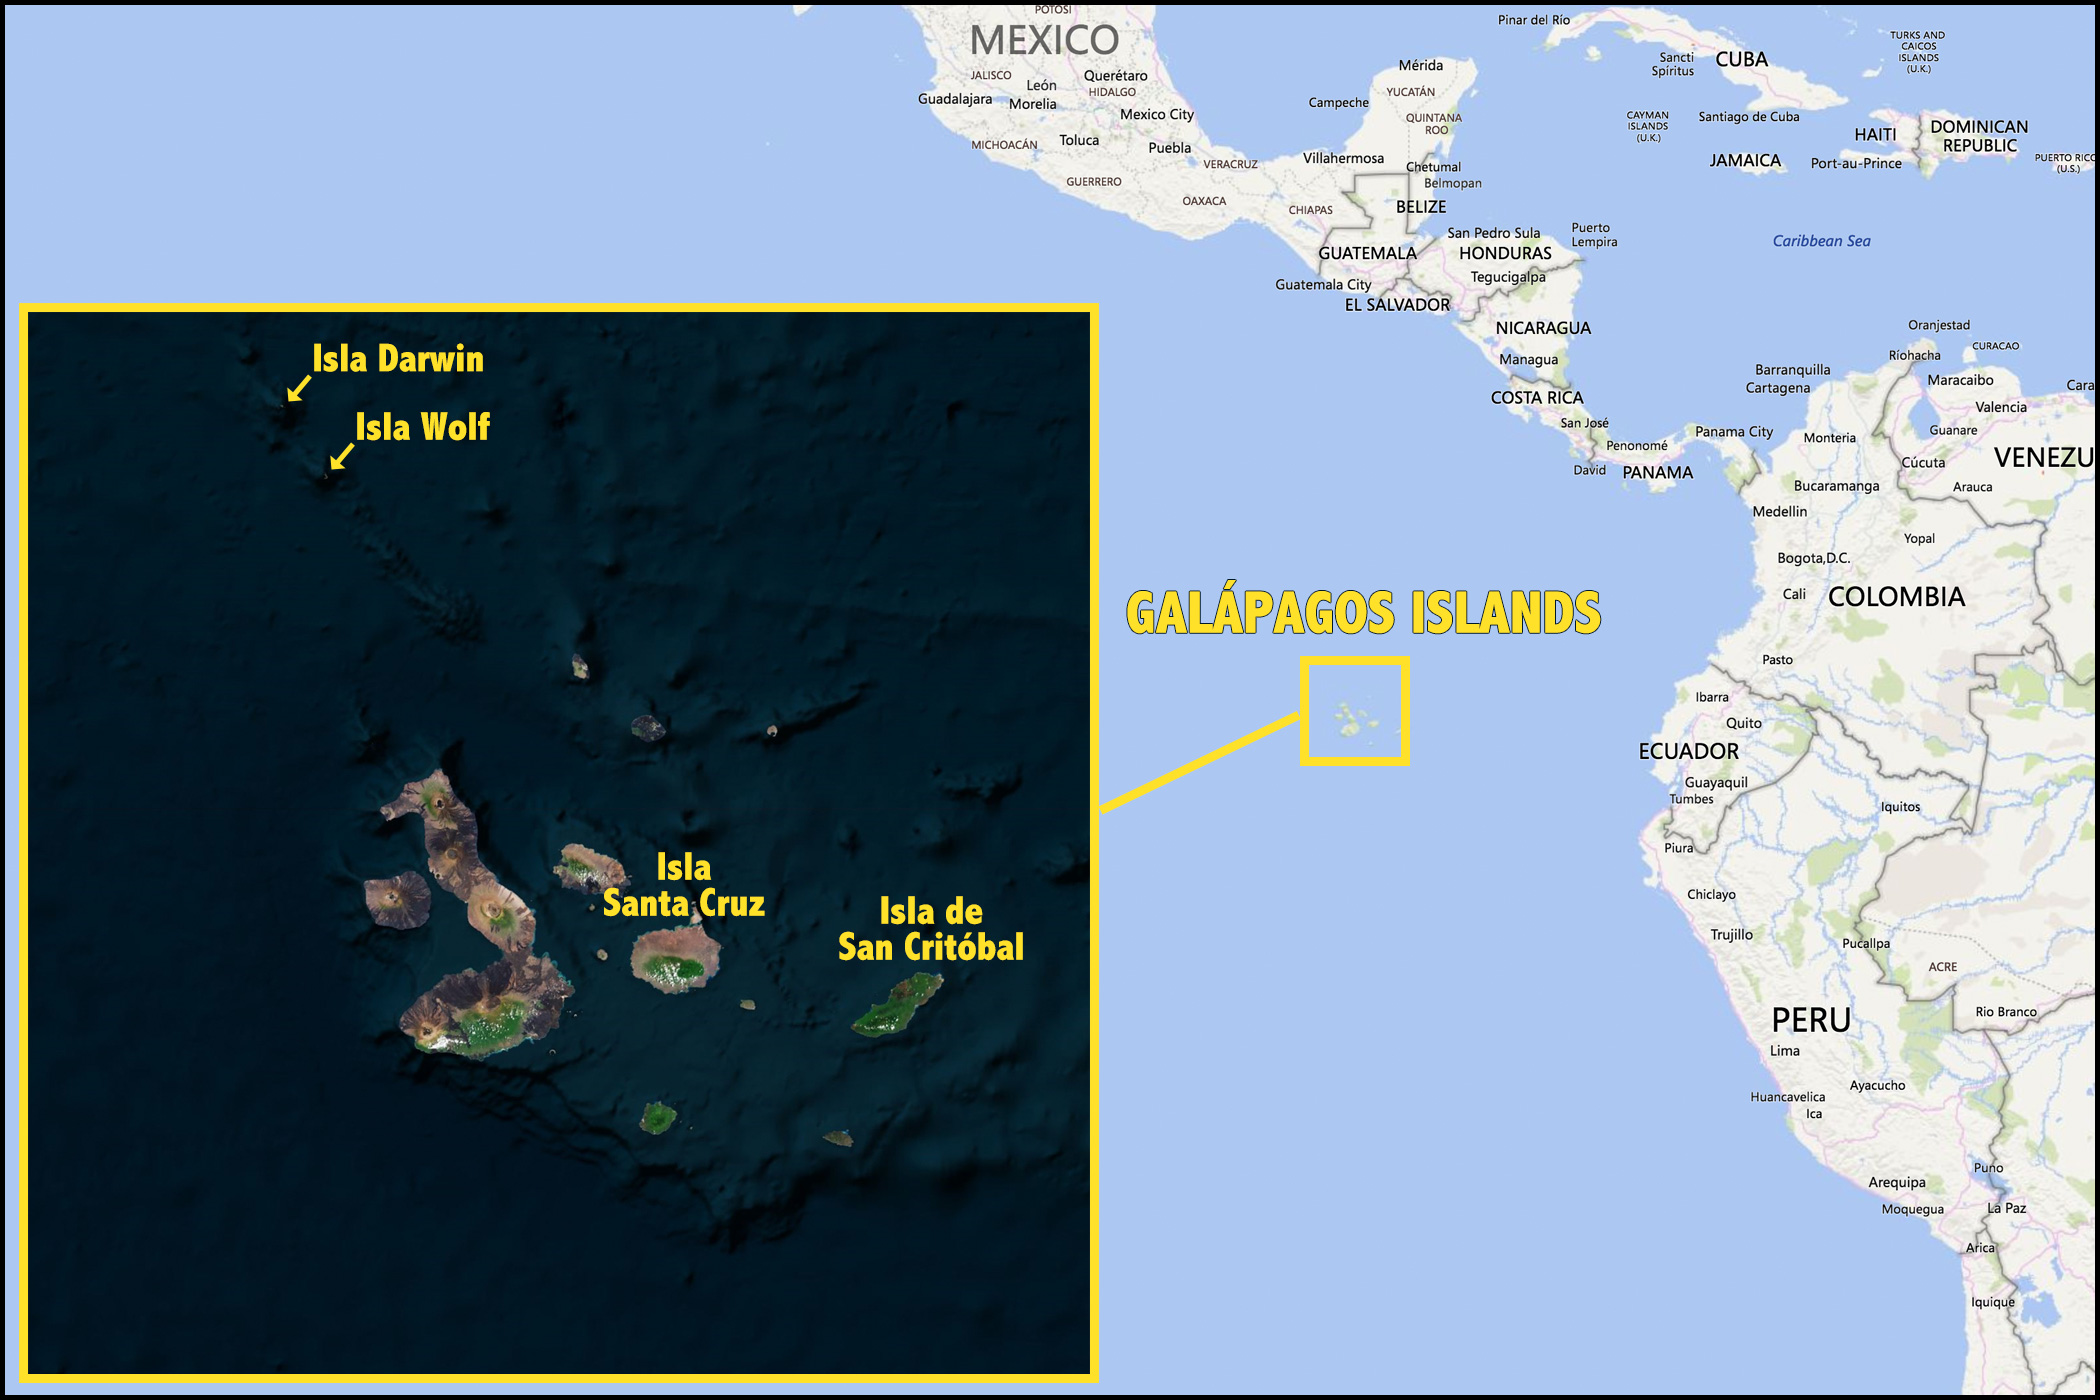 Corals thrive on remotest islands in the Galápagos on floreana island, lesser antilles map, bahamas map, pinta island, puerto rico map, japan map, greenland map, pampas map, ha long bay, yucatan peninsula map, tierra del fuego map, darwin island, bay of fundy, fernandina island, isabela island, baltra island, lake titicaca map, nameless island, patagonia map, puerto baquerizo moreno, strait of magellan map, genovesa island, puerto ayora, galapagos national park, oman map, canada map, charles darwin research station, pacific map, amazon map, cuba map, cape horn map, falklands map, ecuador map, brazilian highlands map,